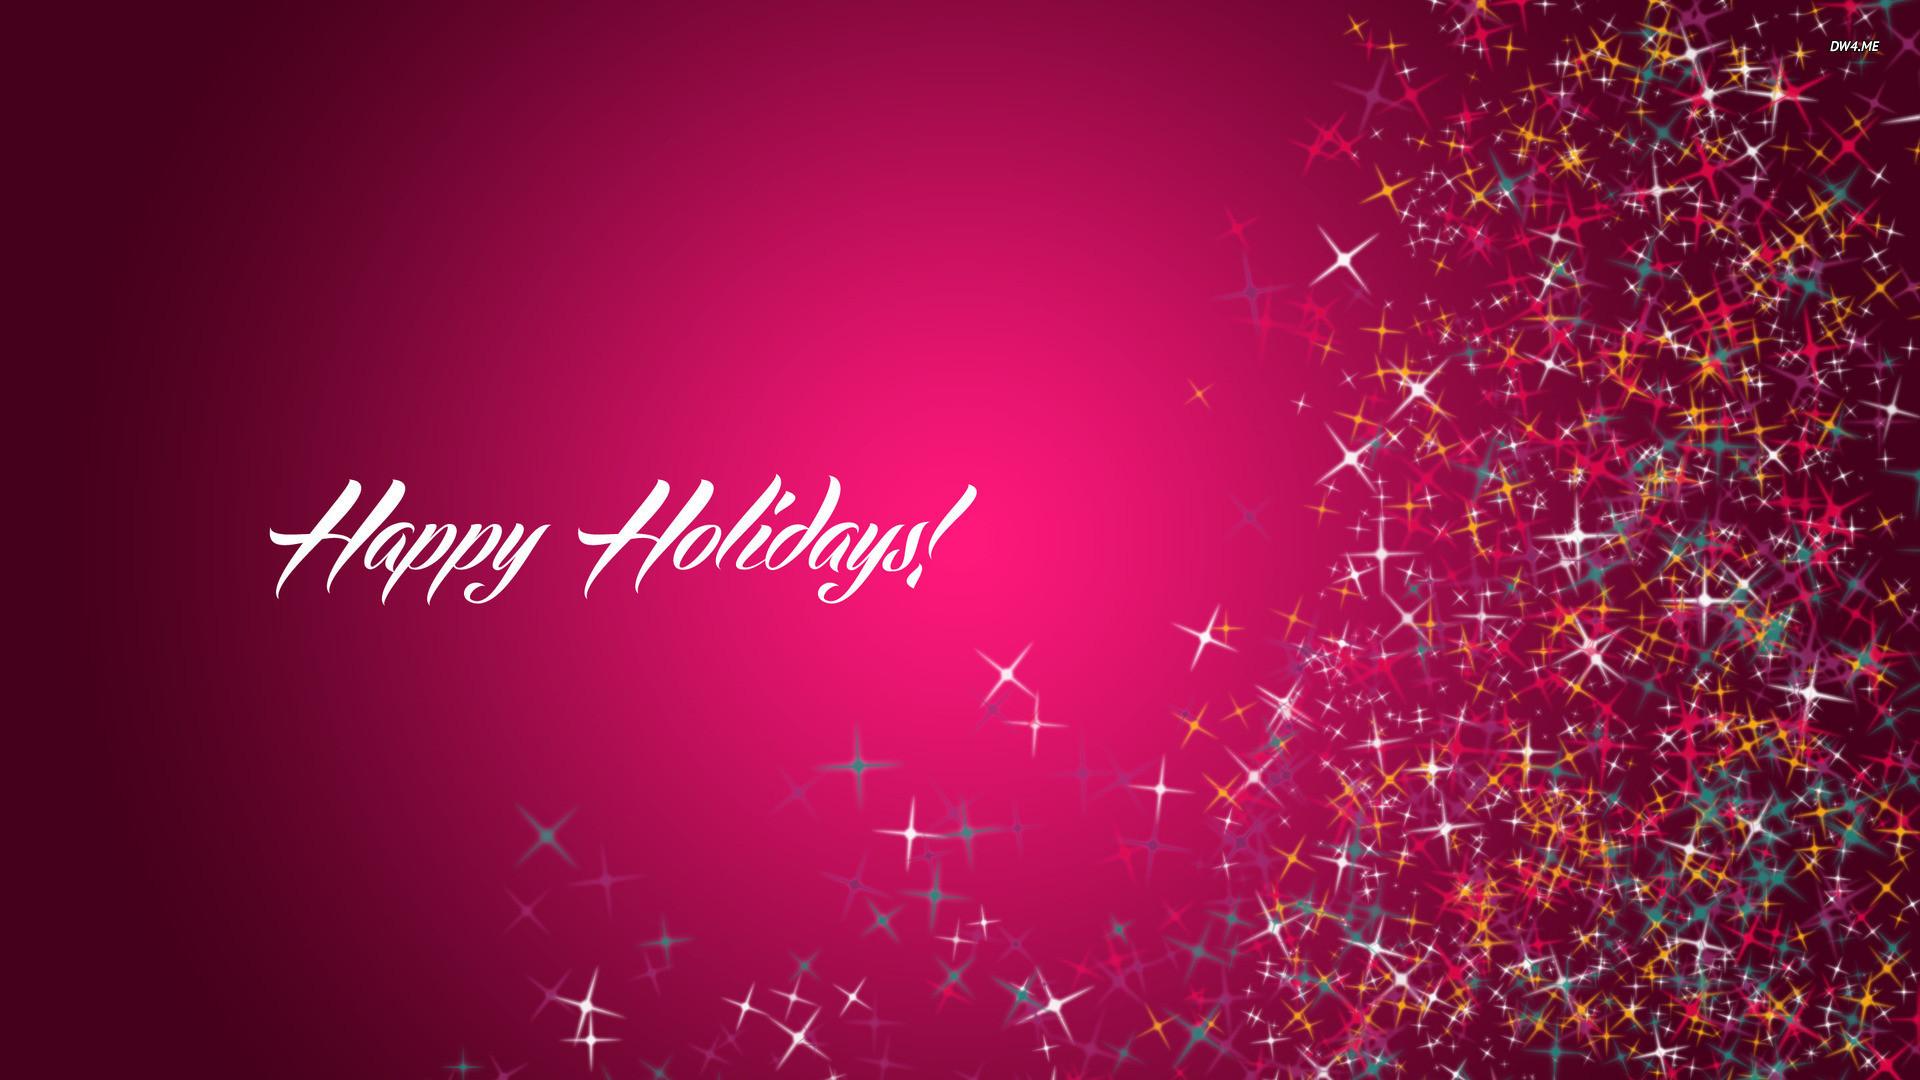 Res: 1920x1080,  Happy Holidays wallpaper